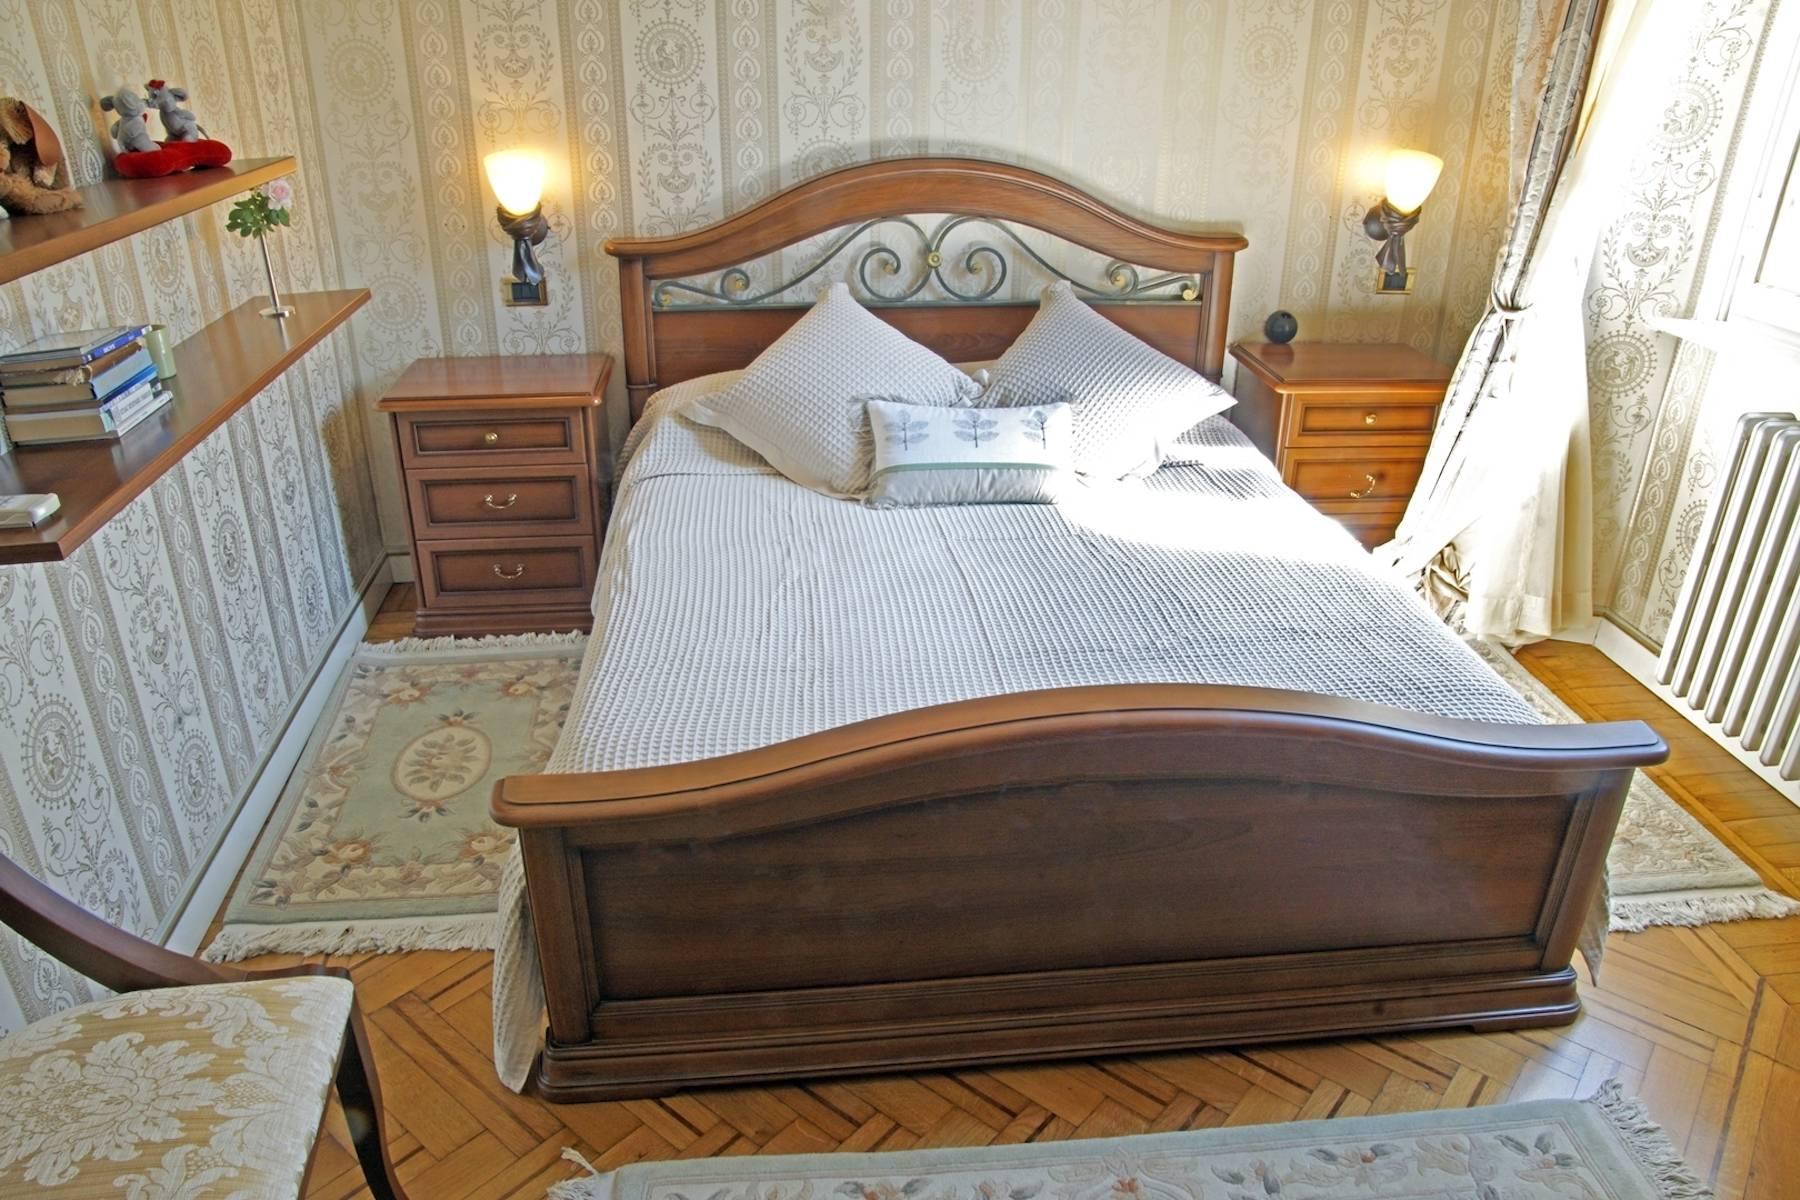 Villa in Vendita a Stresa: 5 locali, 700 mq - Foto 14